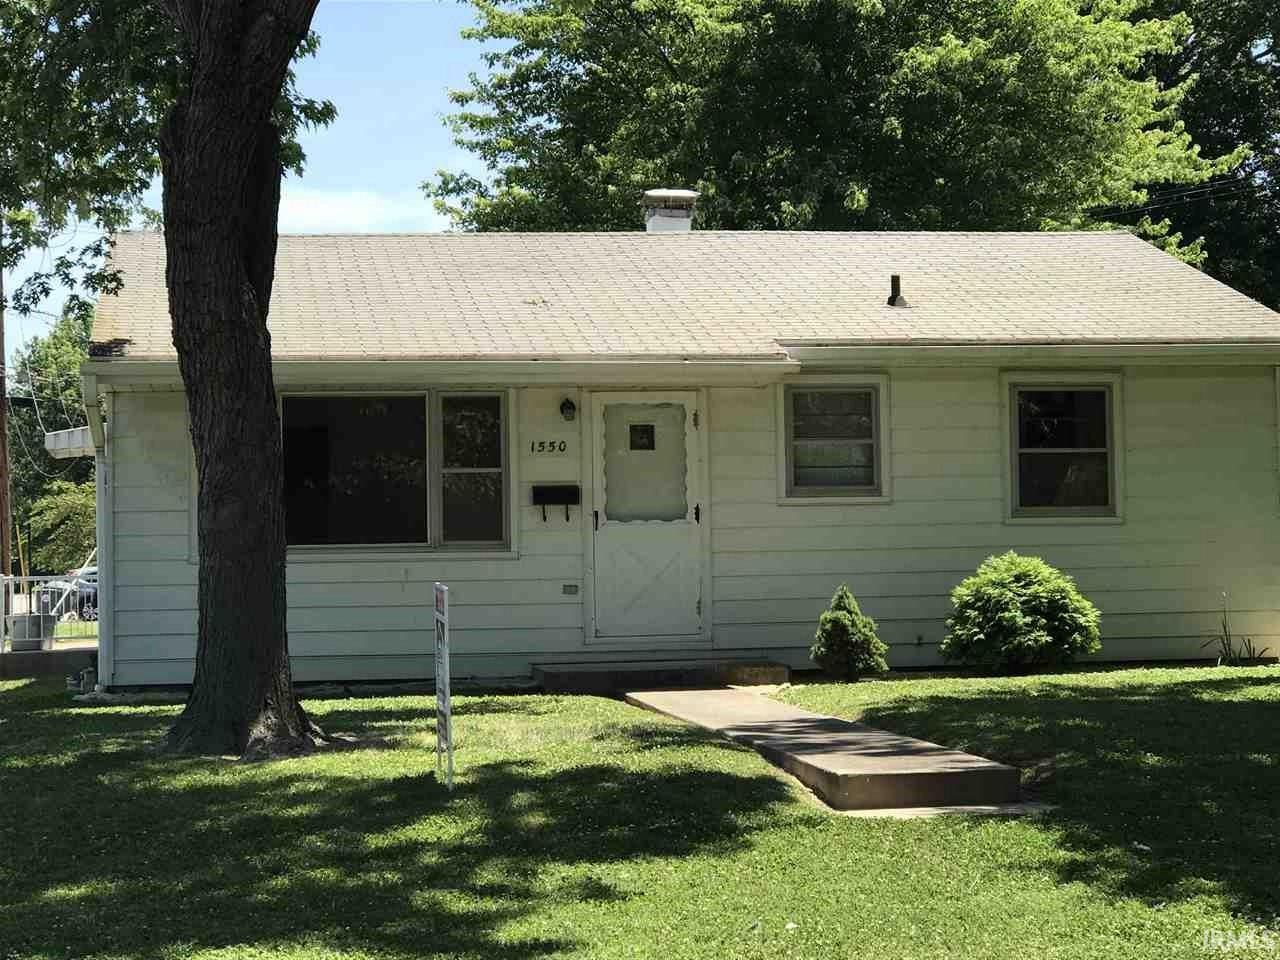 1550 S Alvord, Evansville, IN 47714